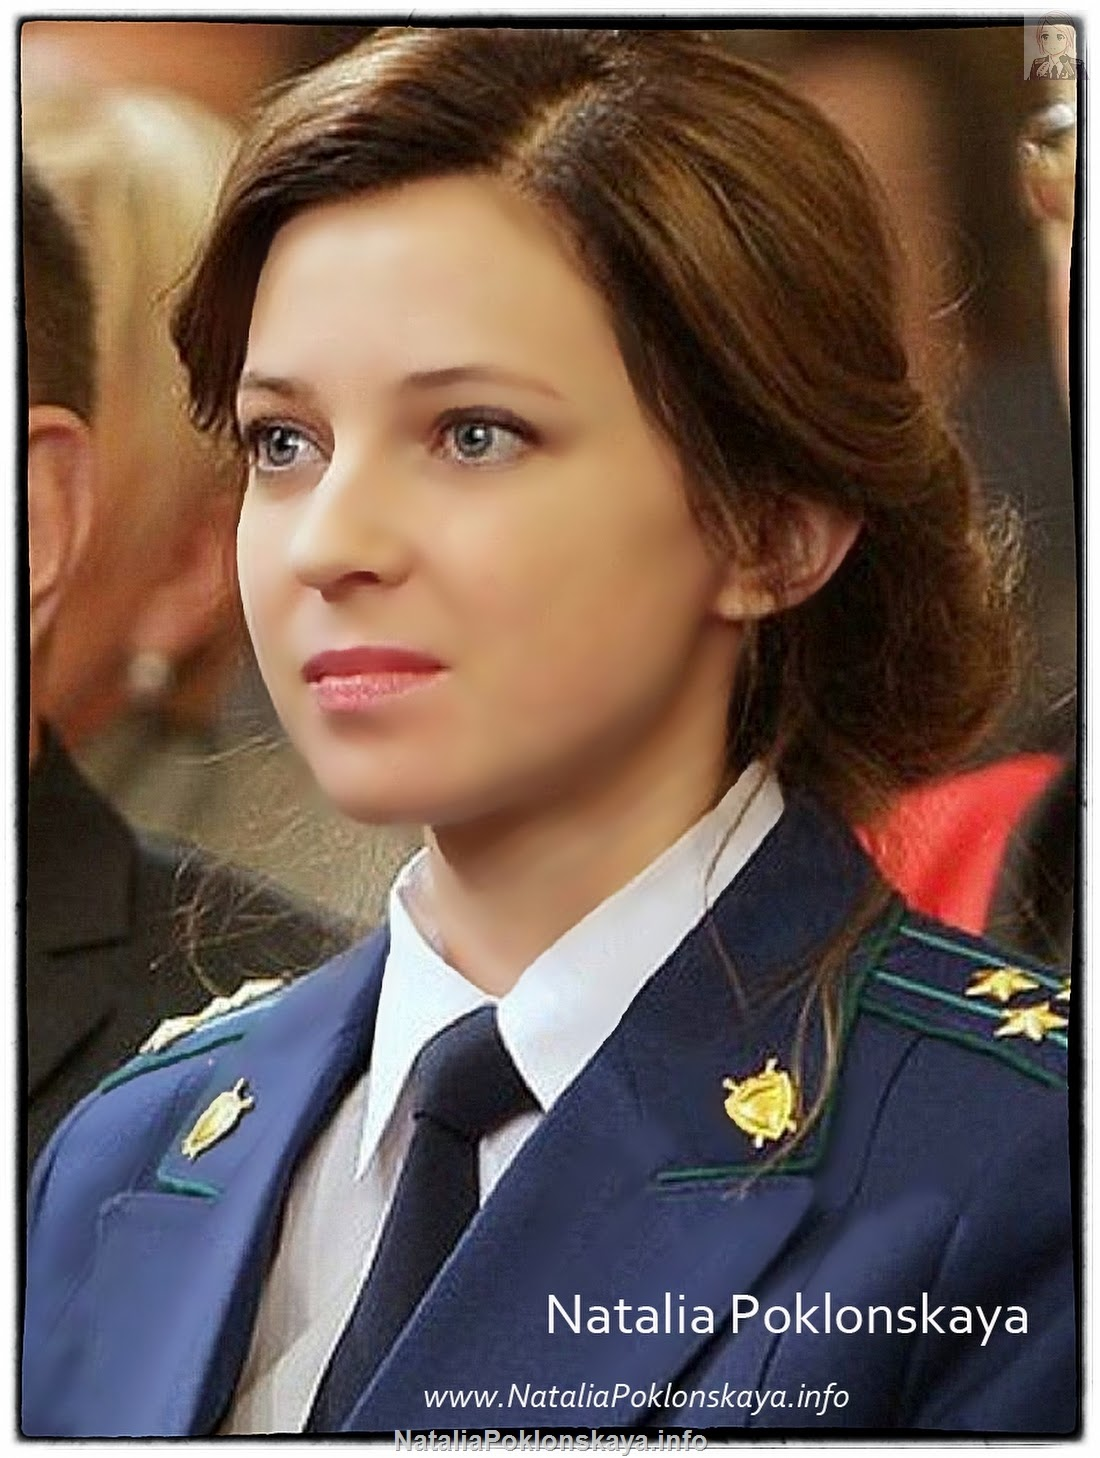 Natalia Poklonskaya, former Prosecutor General of Crimea